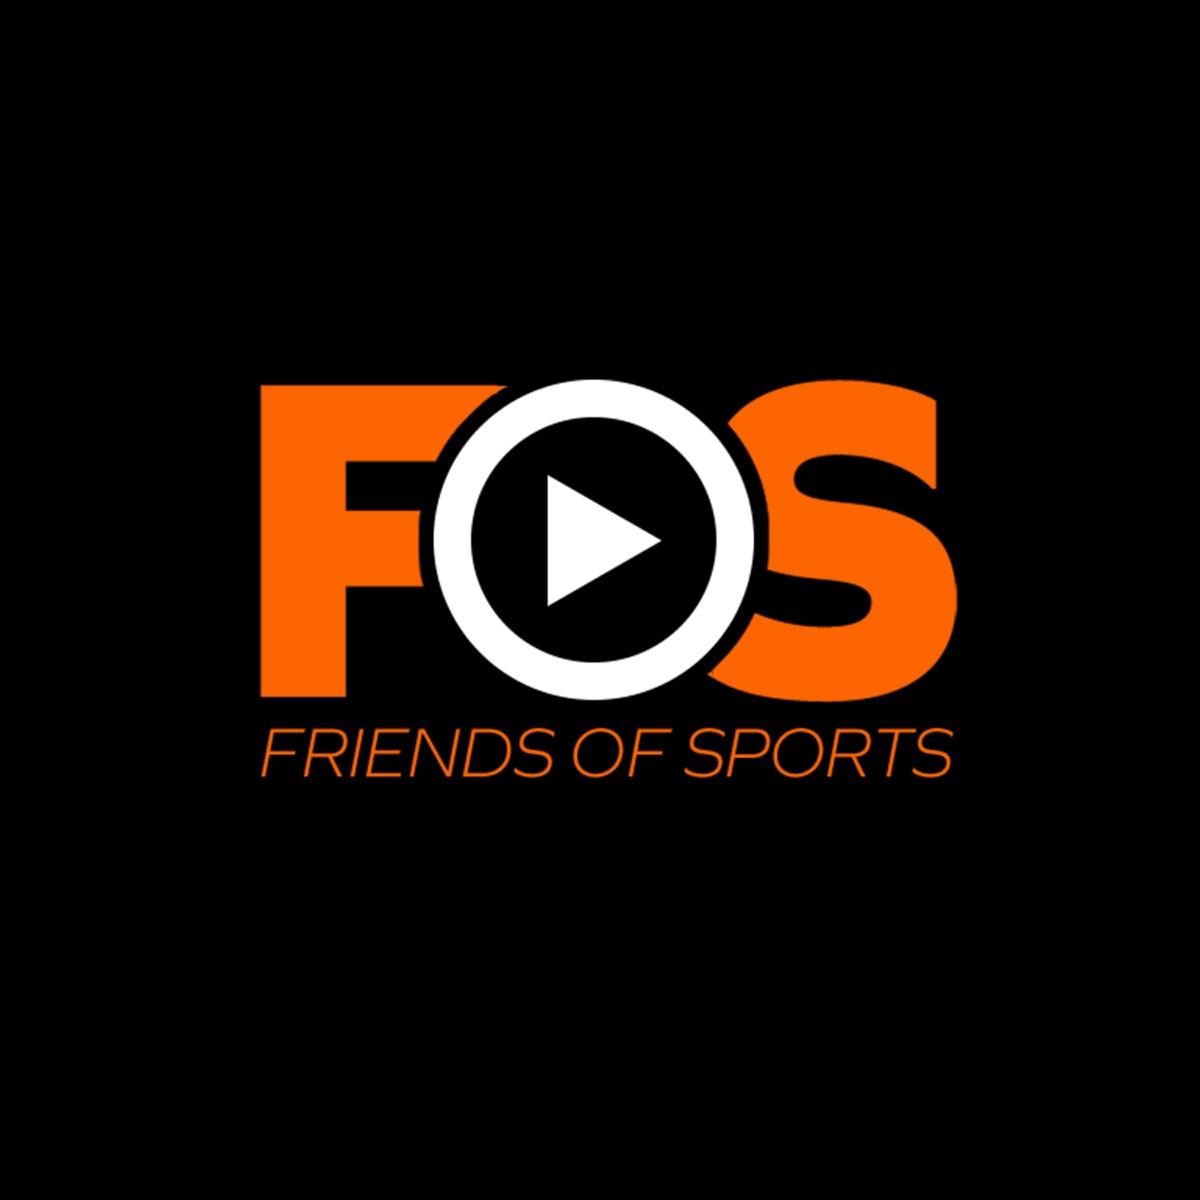 Friends of Sports